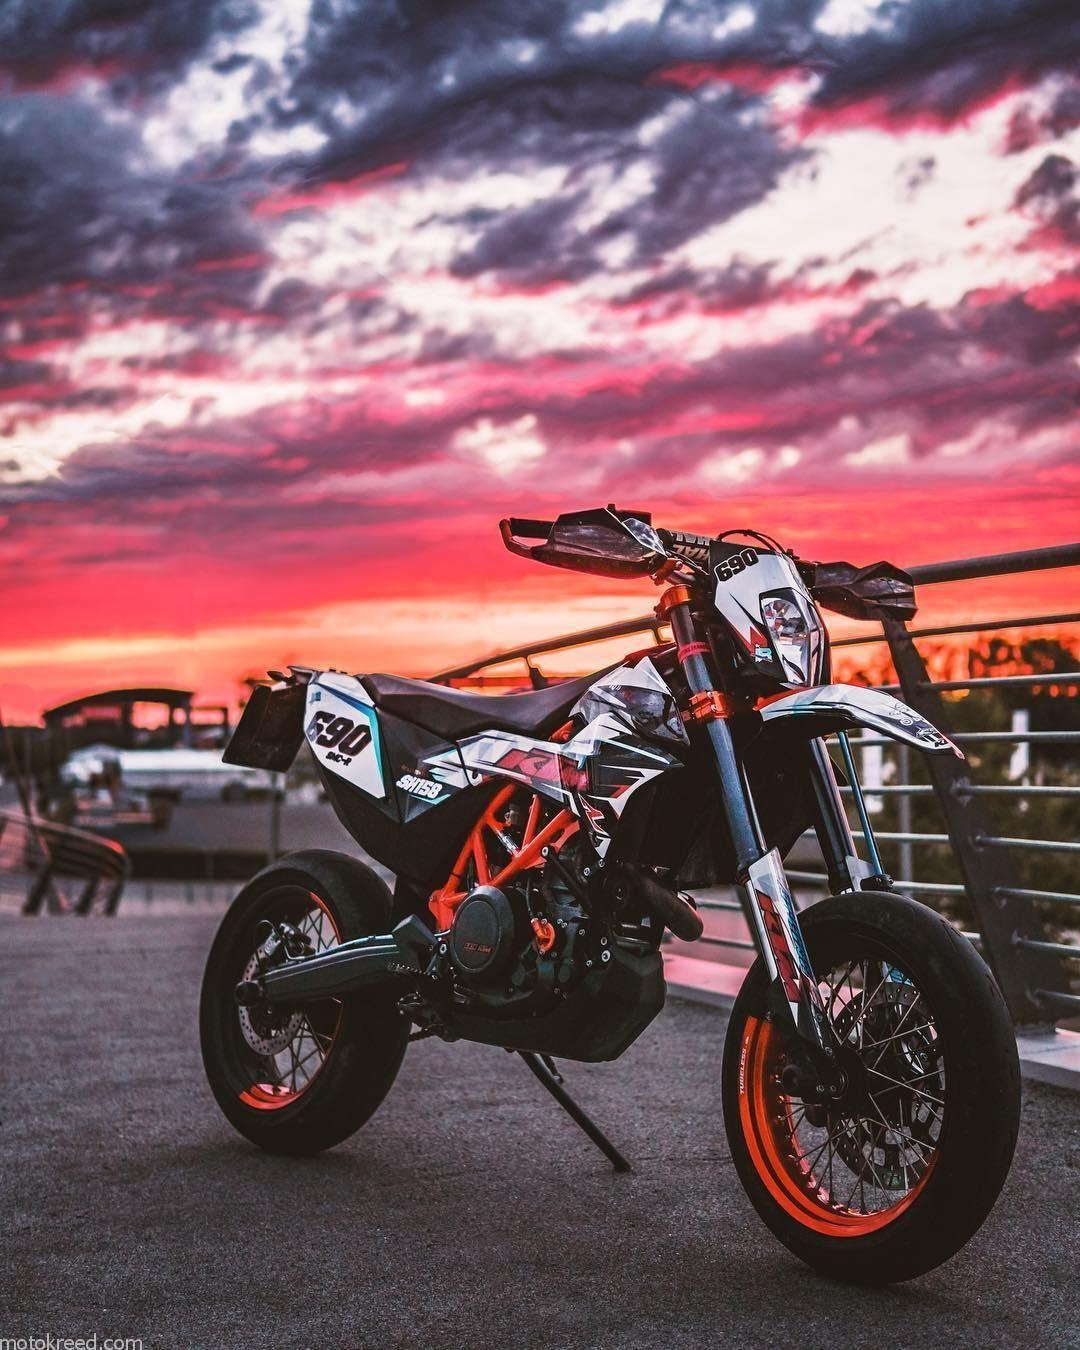 pin by michael price on super moto motorcross bike ktm. Black Bedroom Furniture Sets. Home Design Ideas